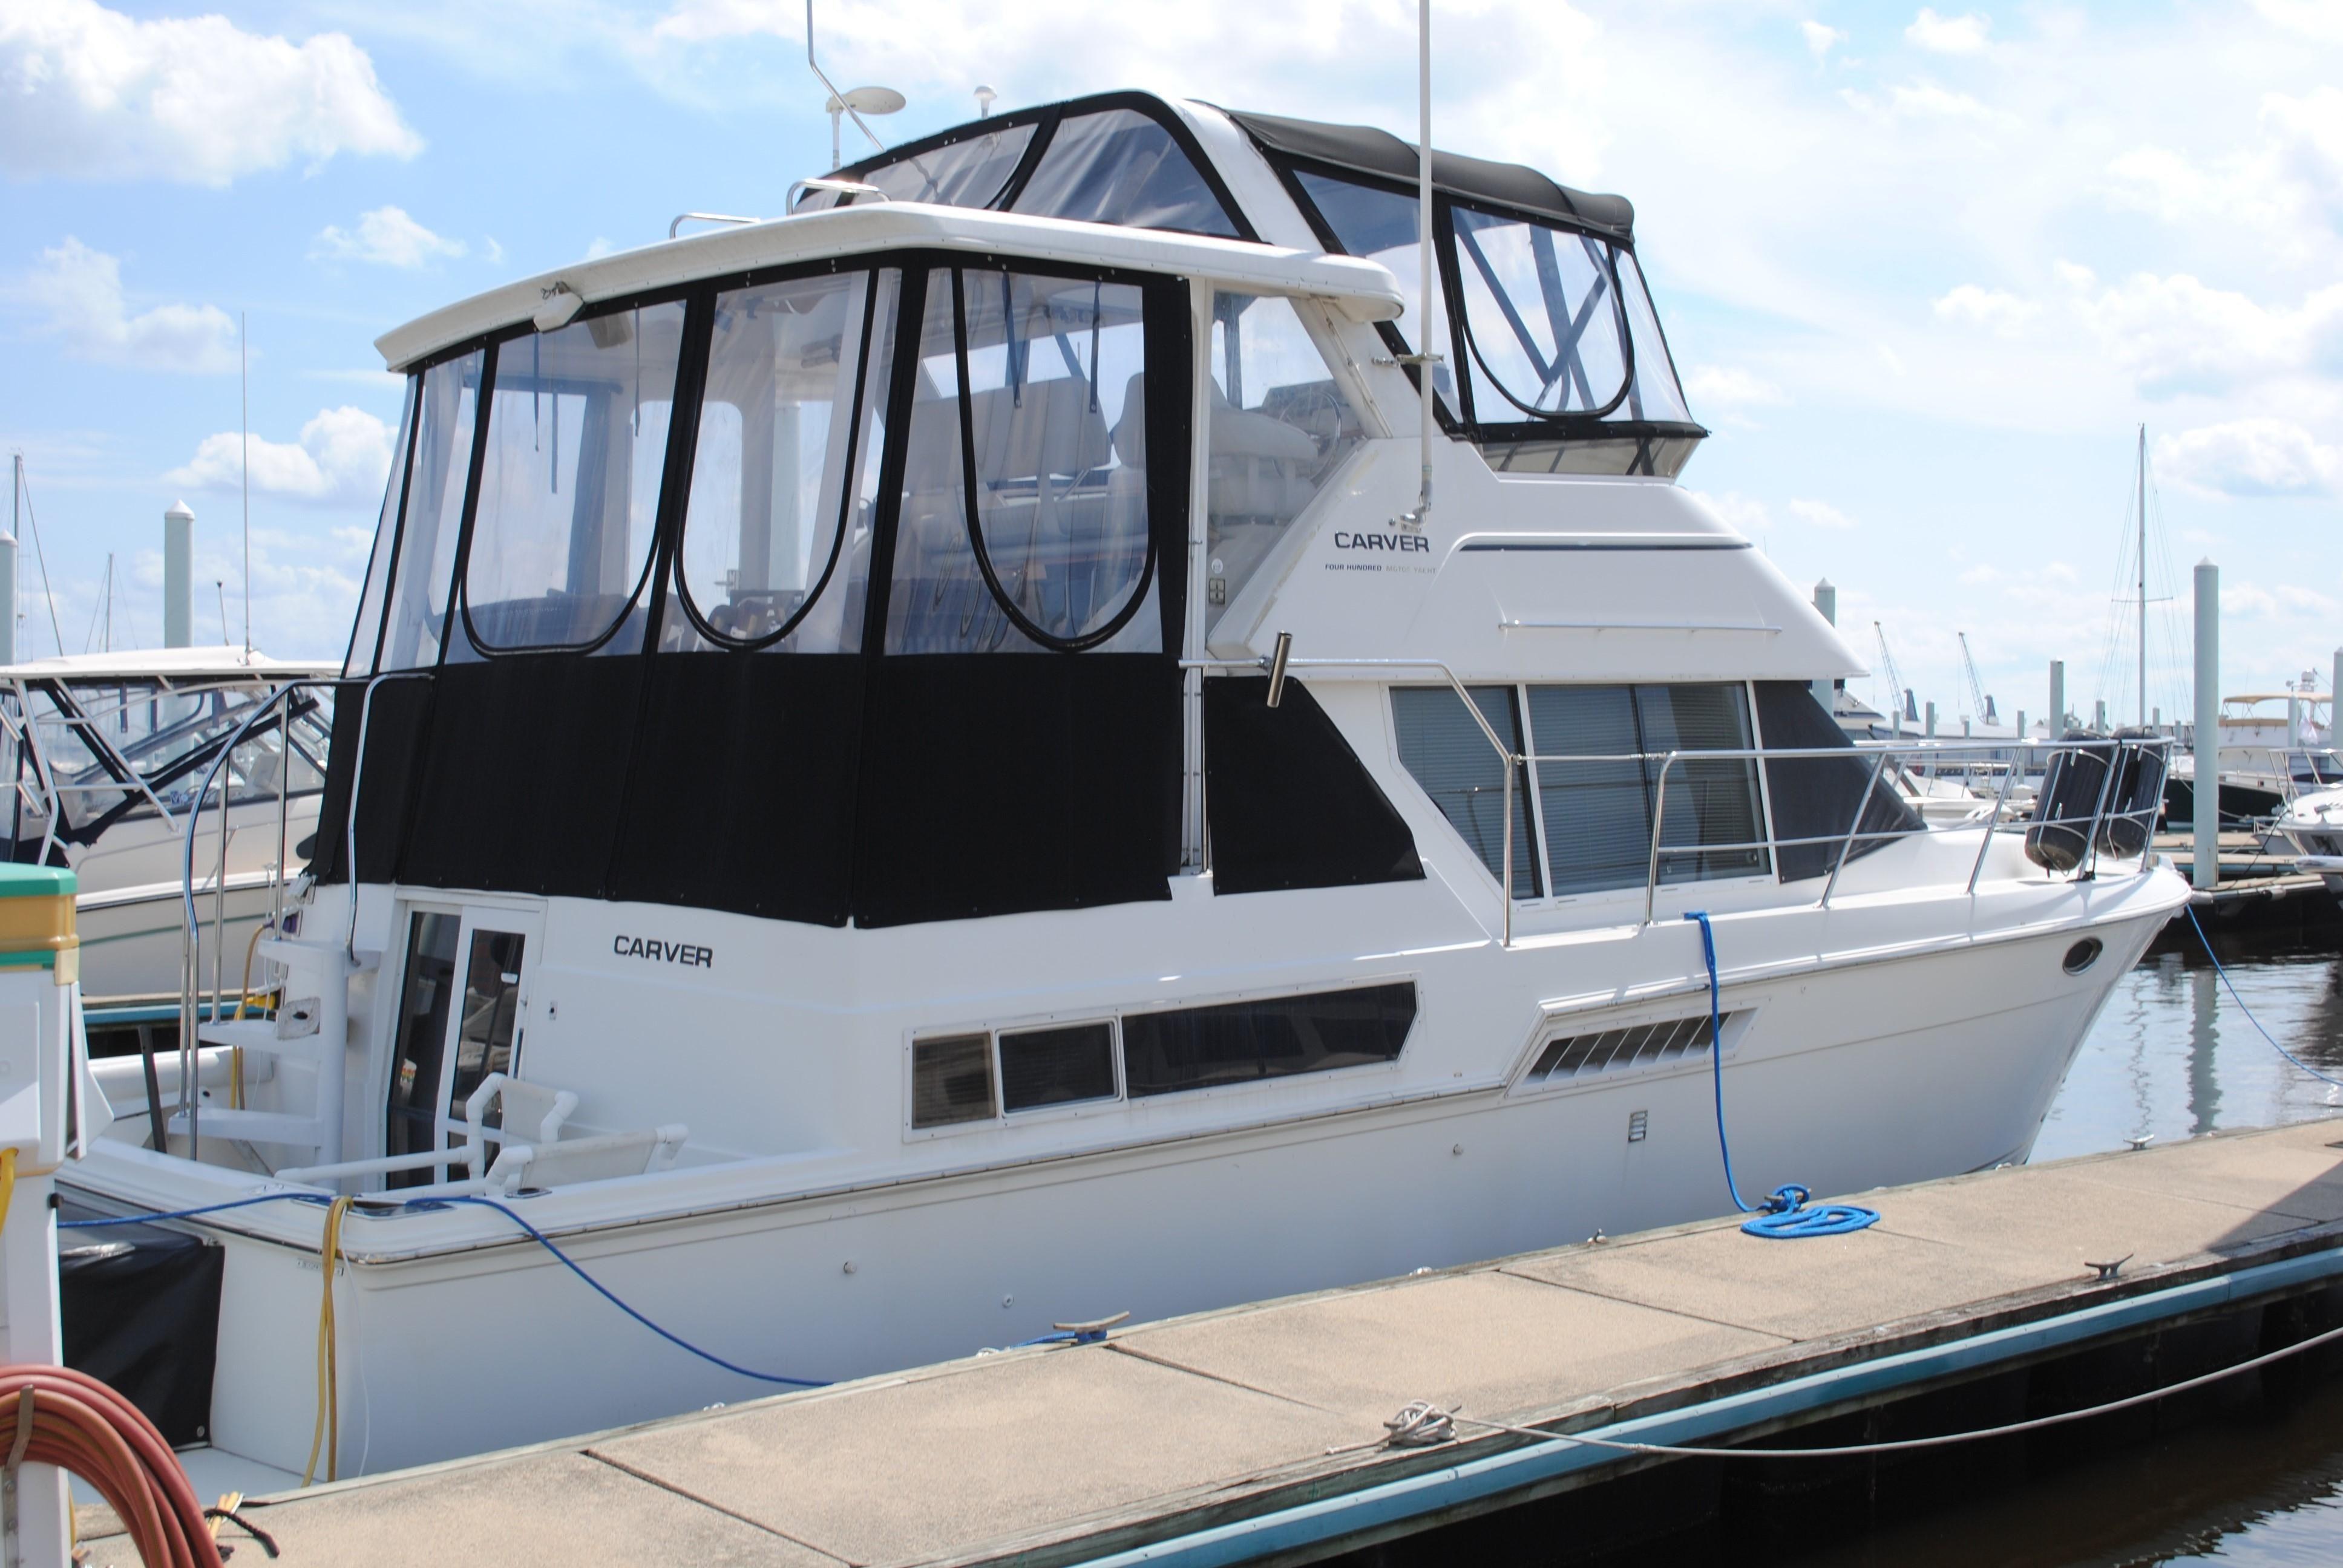 1998 Carver 400 Cockpit Motor Yacht Power Boat For Sale